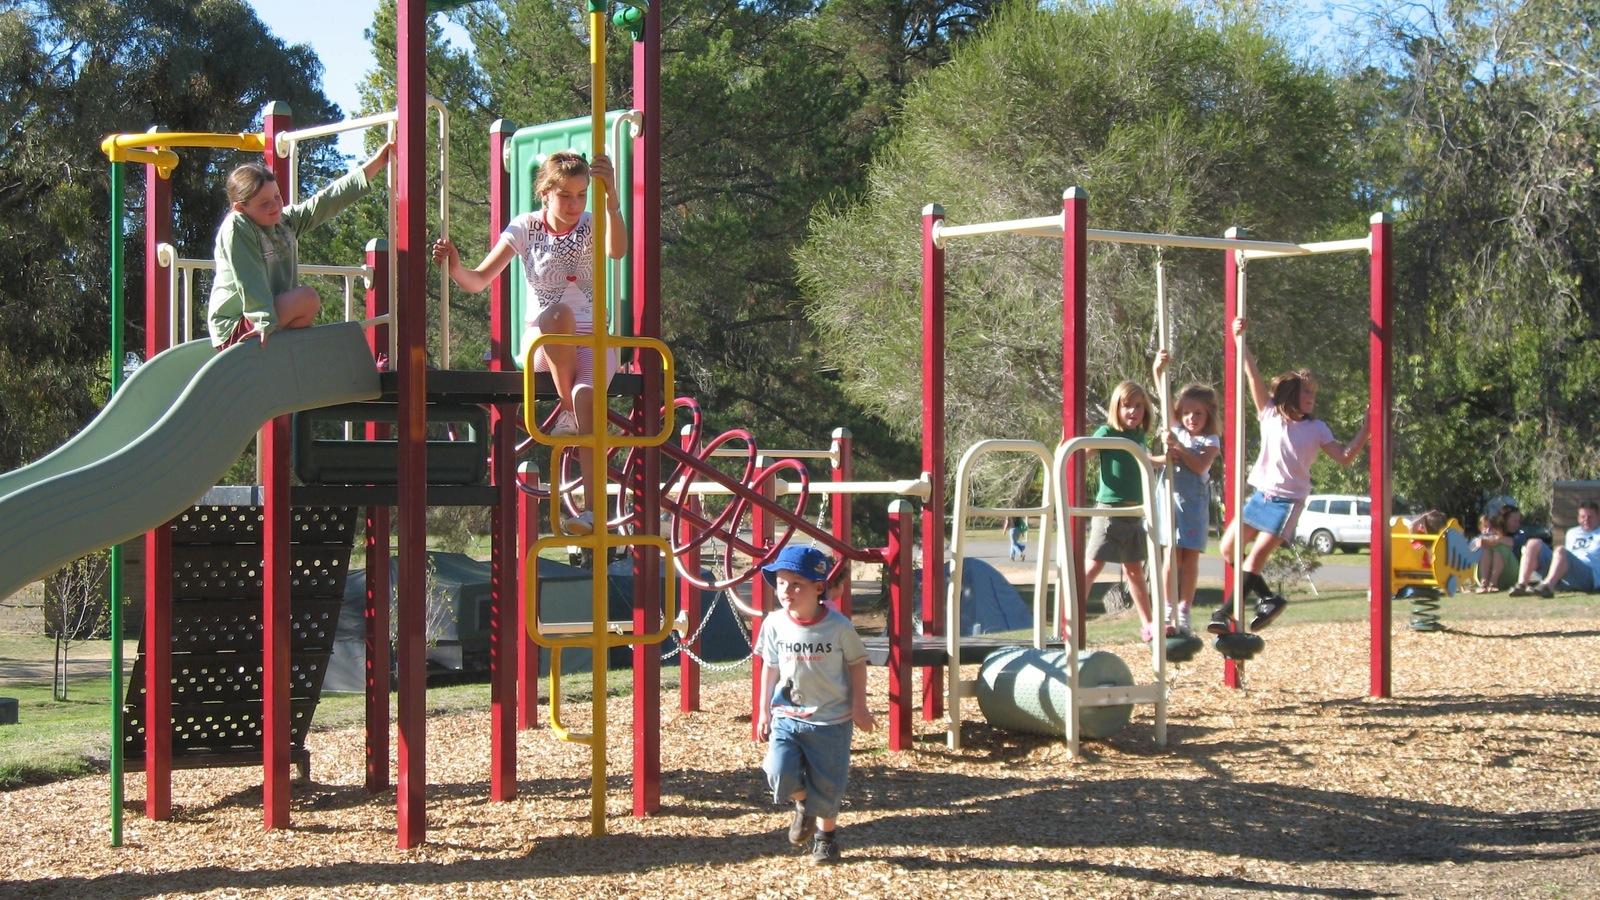 Playground for kids to enjoy